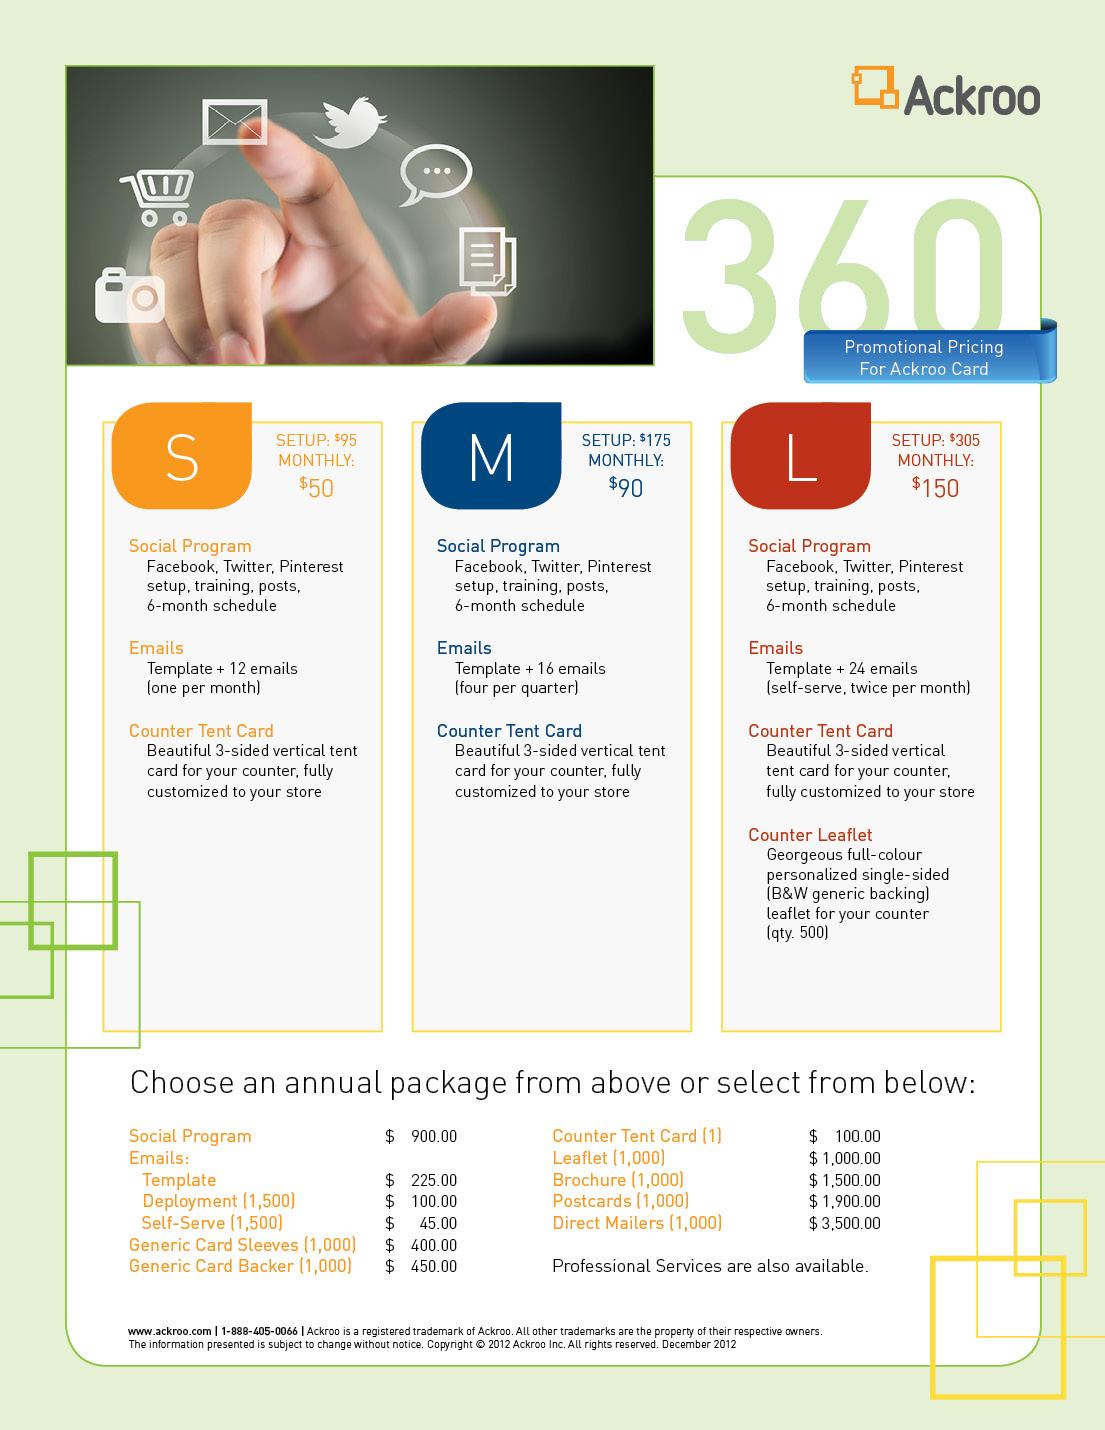 Ackroo 360 marketing services2.jpg